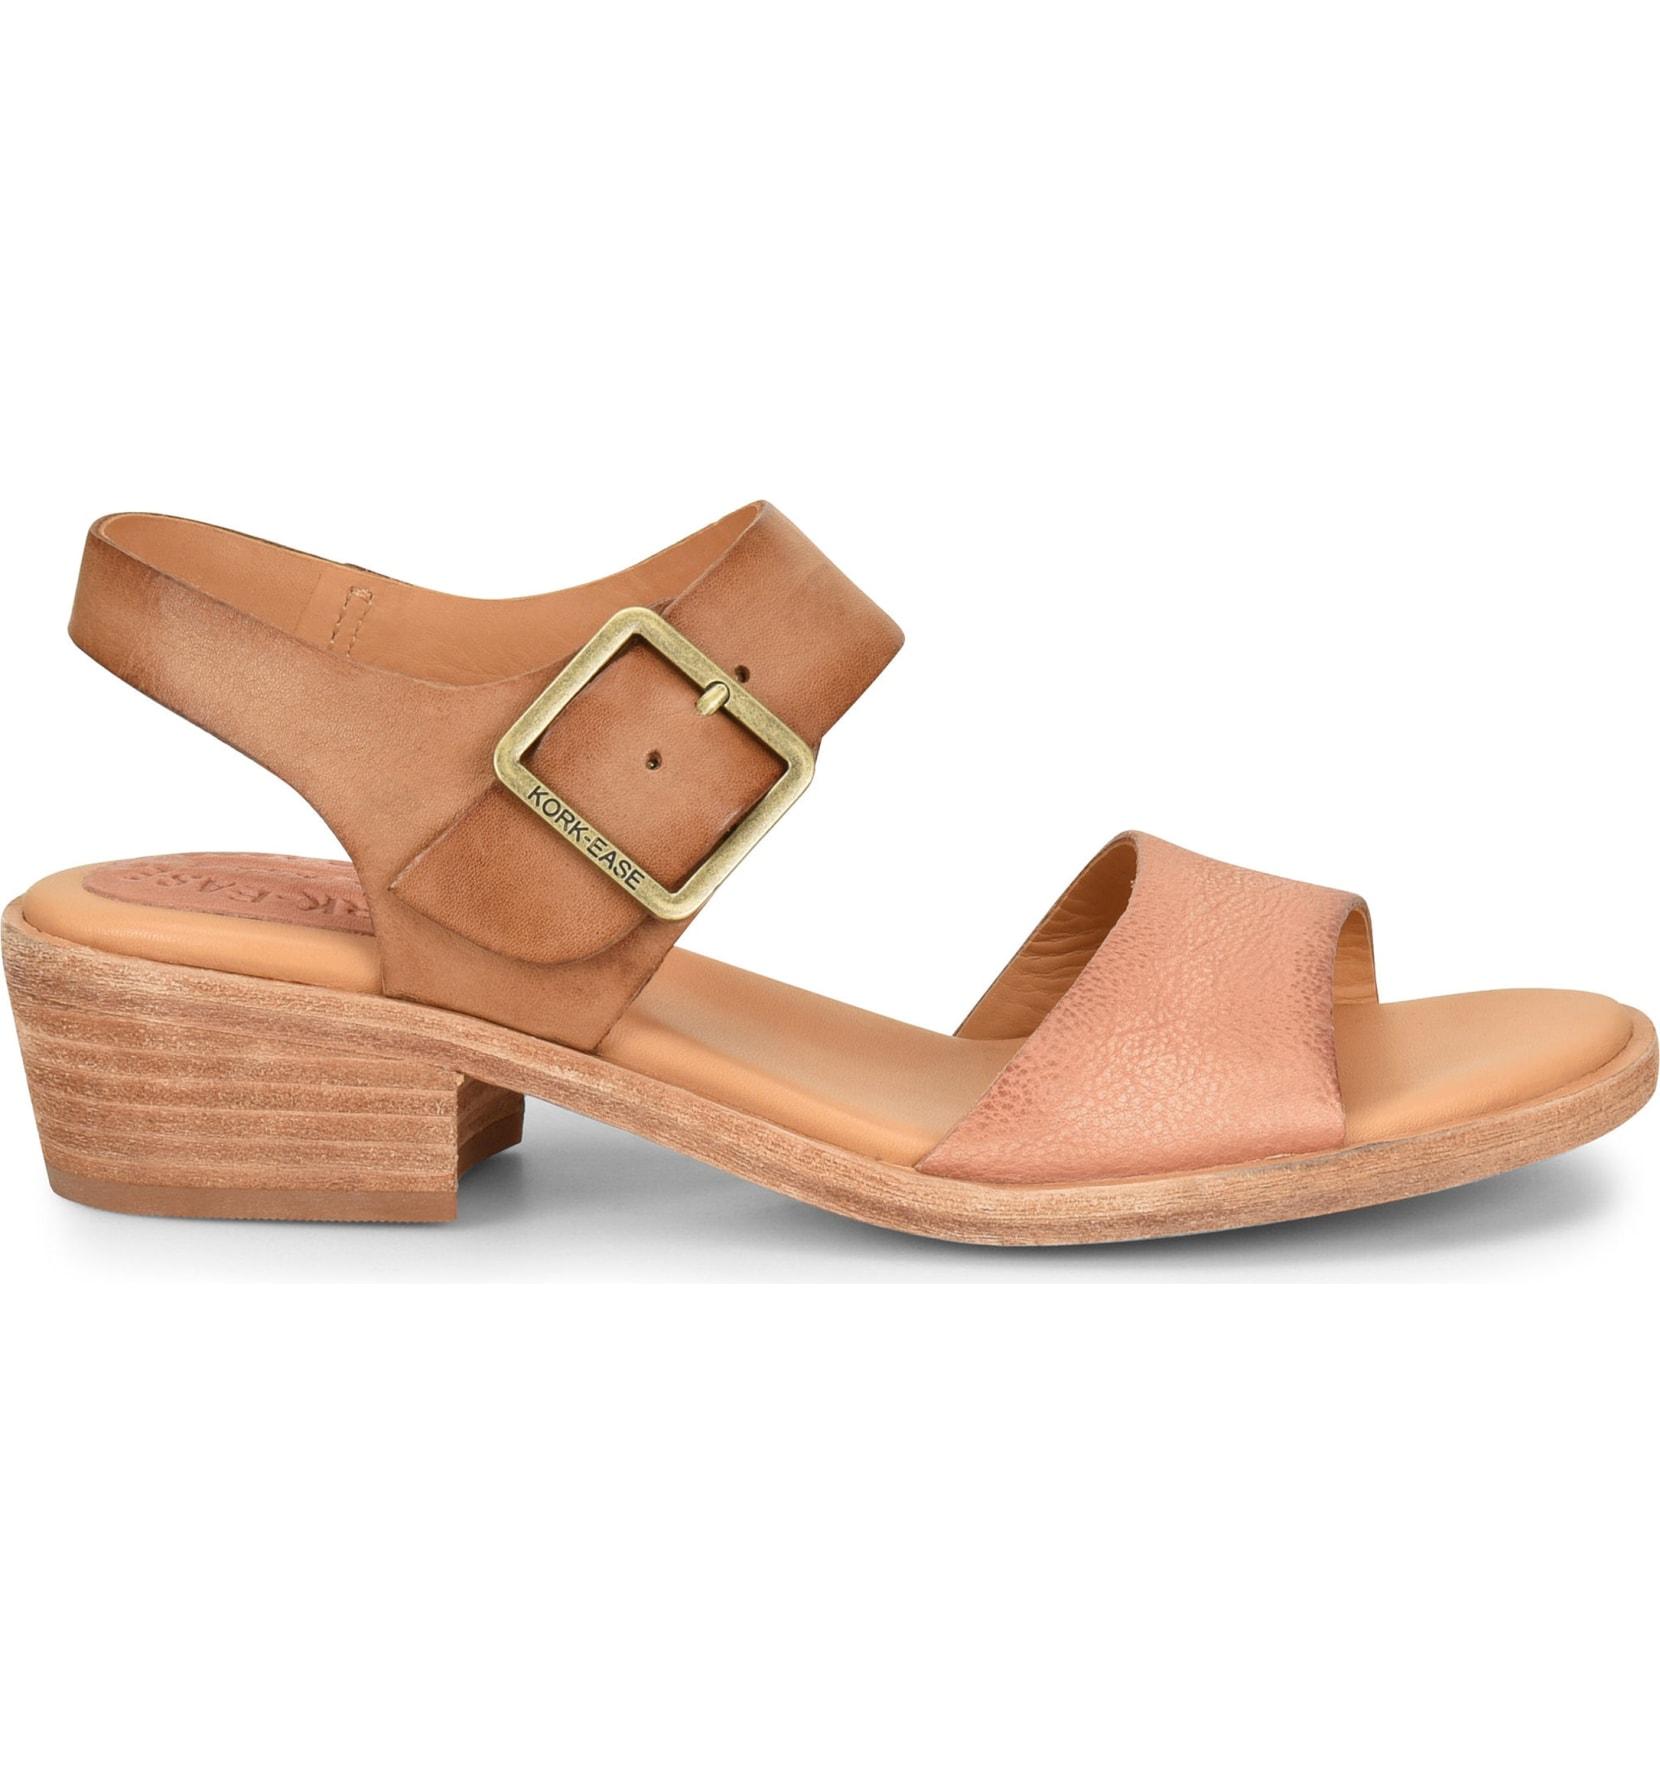 Kork-Ease Myakka Sandal